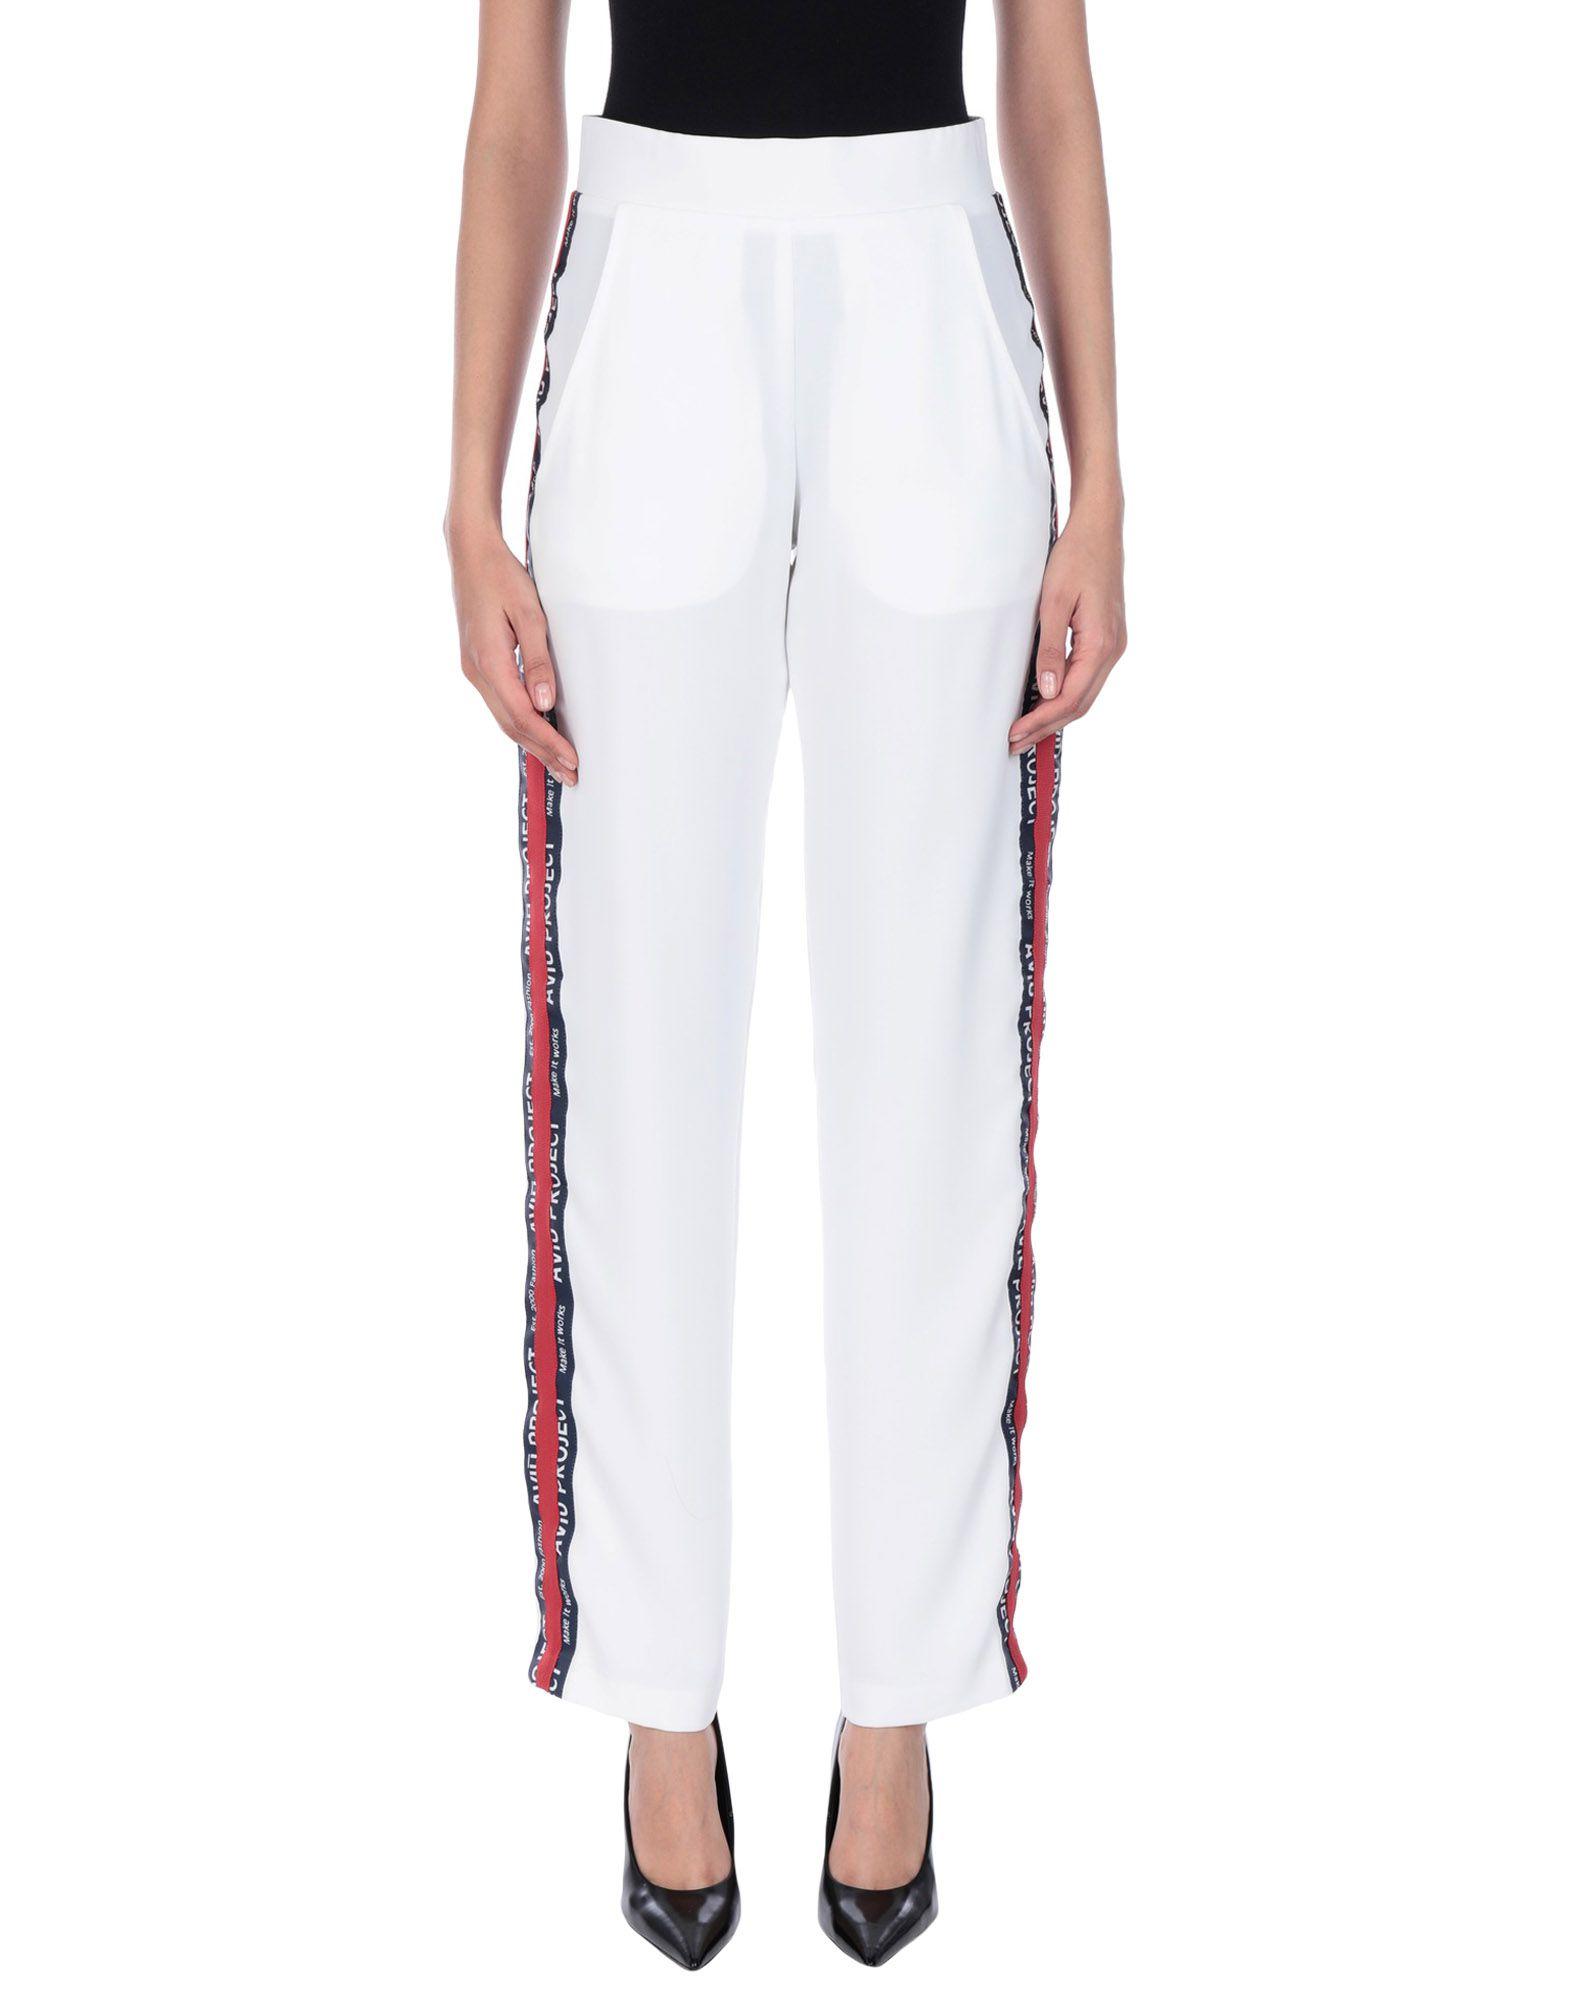 Pantalone Aviù donna - - - 13314211LH a38